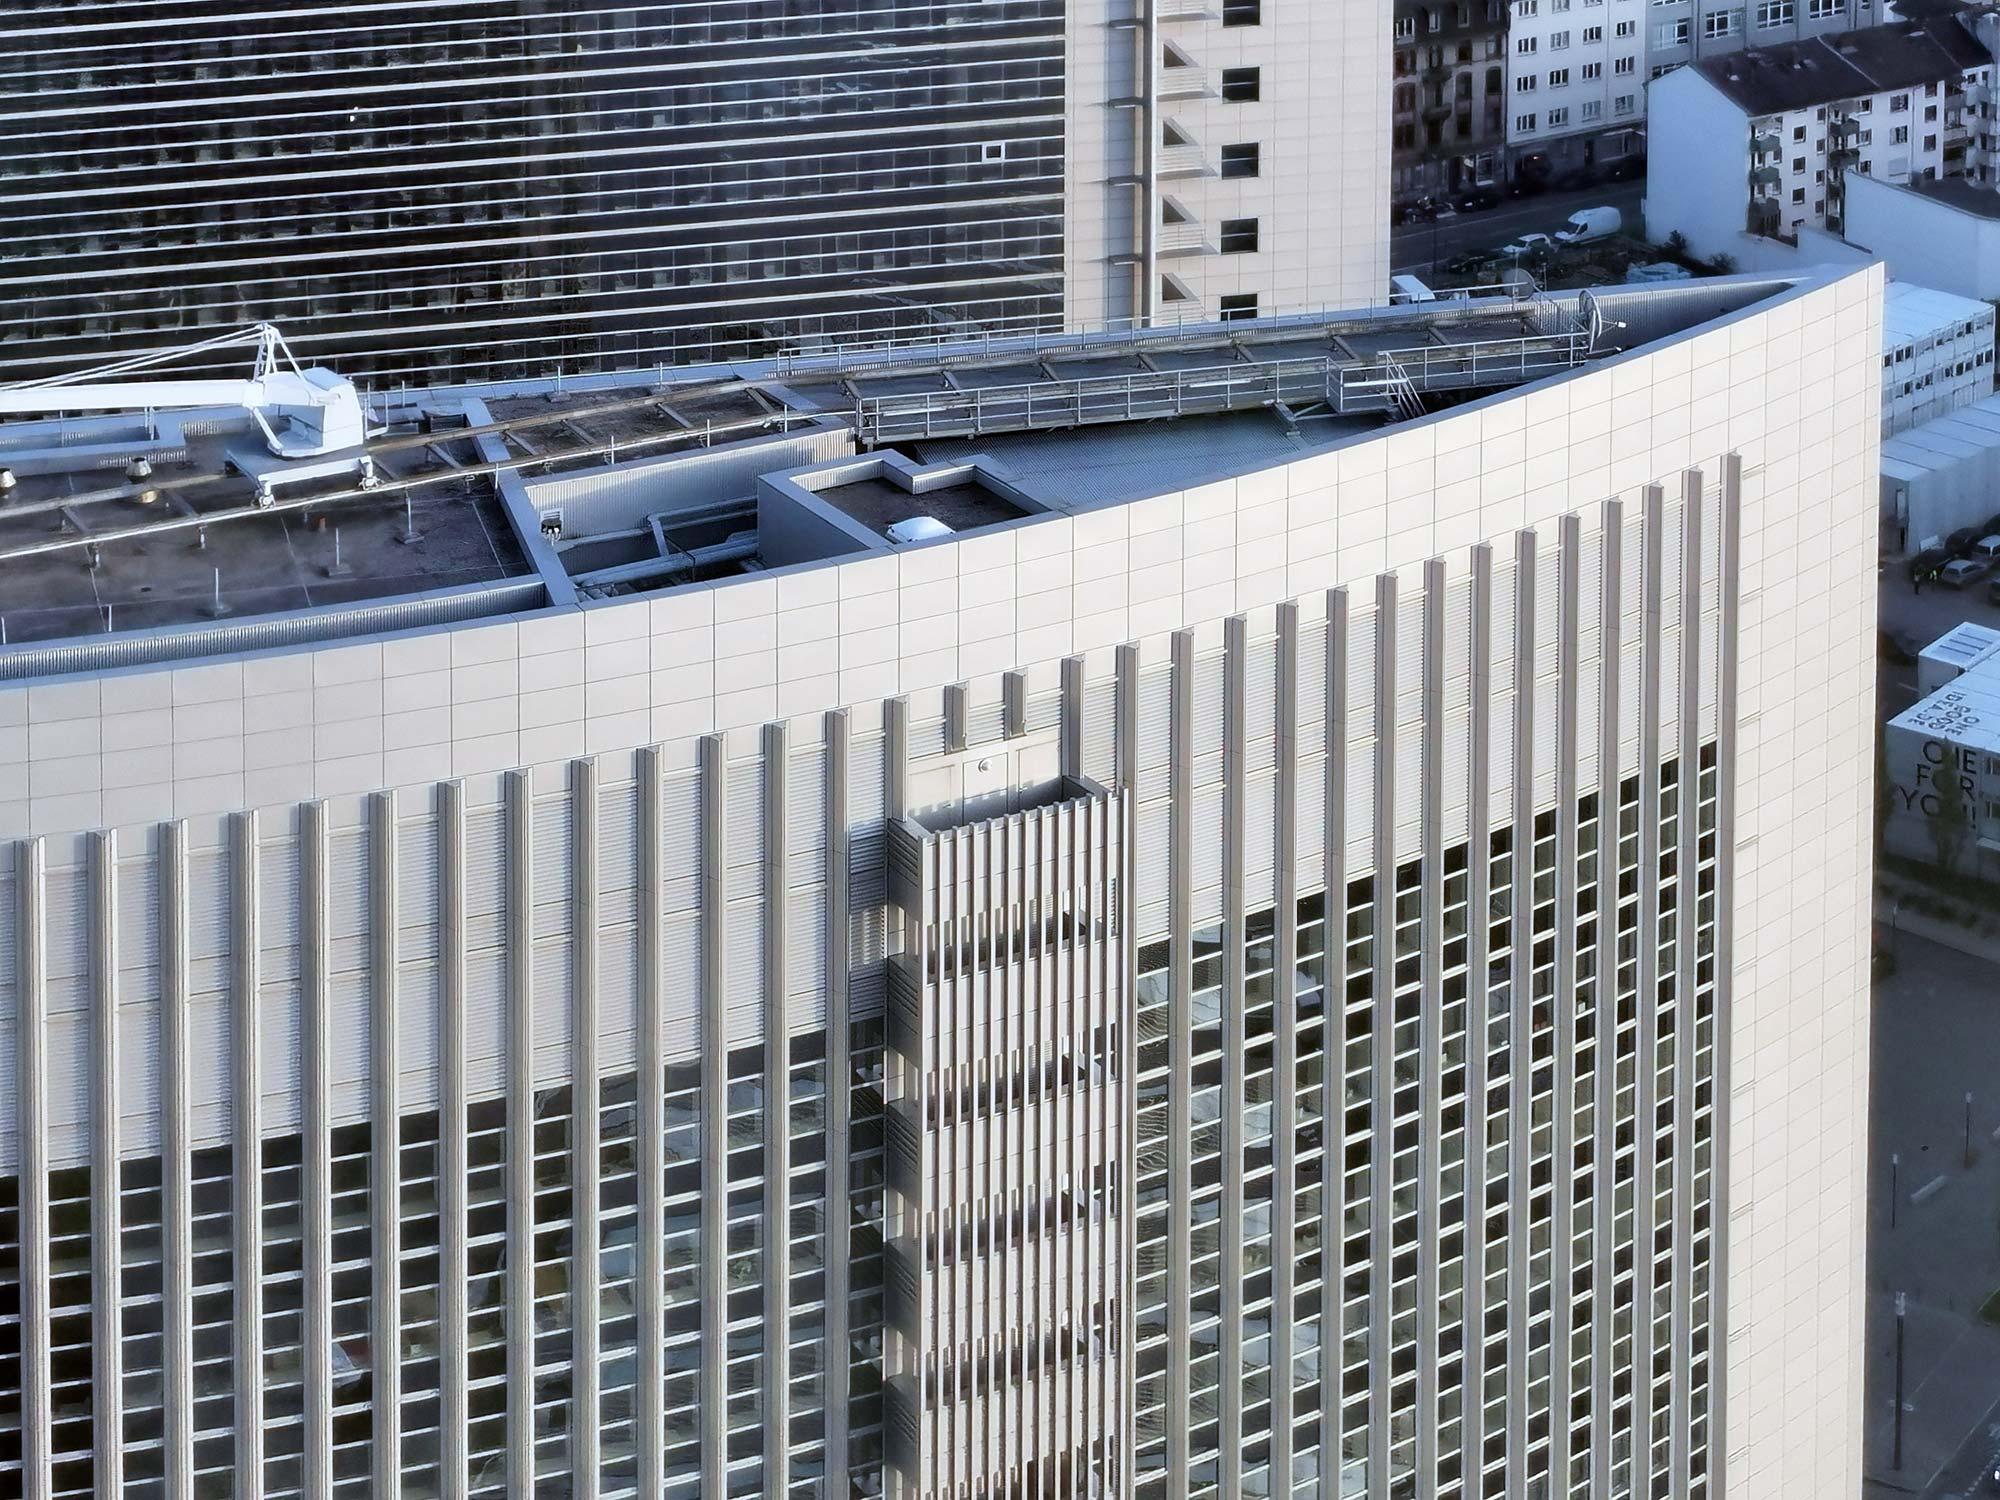 Kastor Frankfurt - Hochhausfassade - Büroturm mit Mietflächen